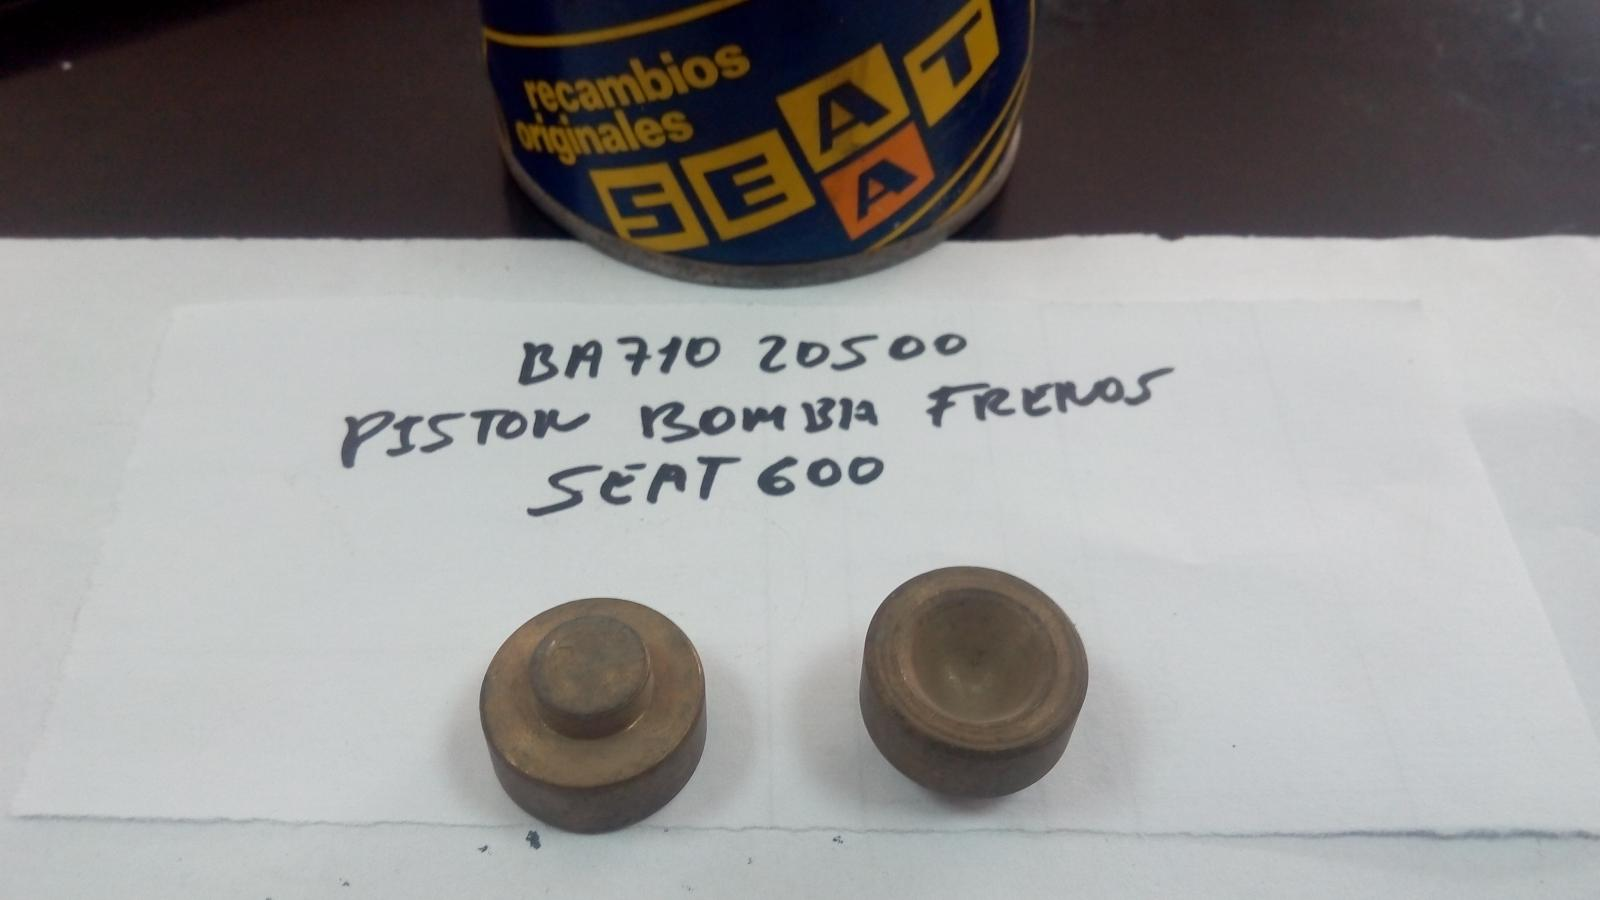 PISTÓN BOMBA DE FRENOS SEAT 600